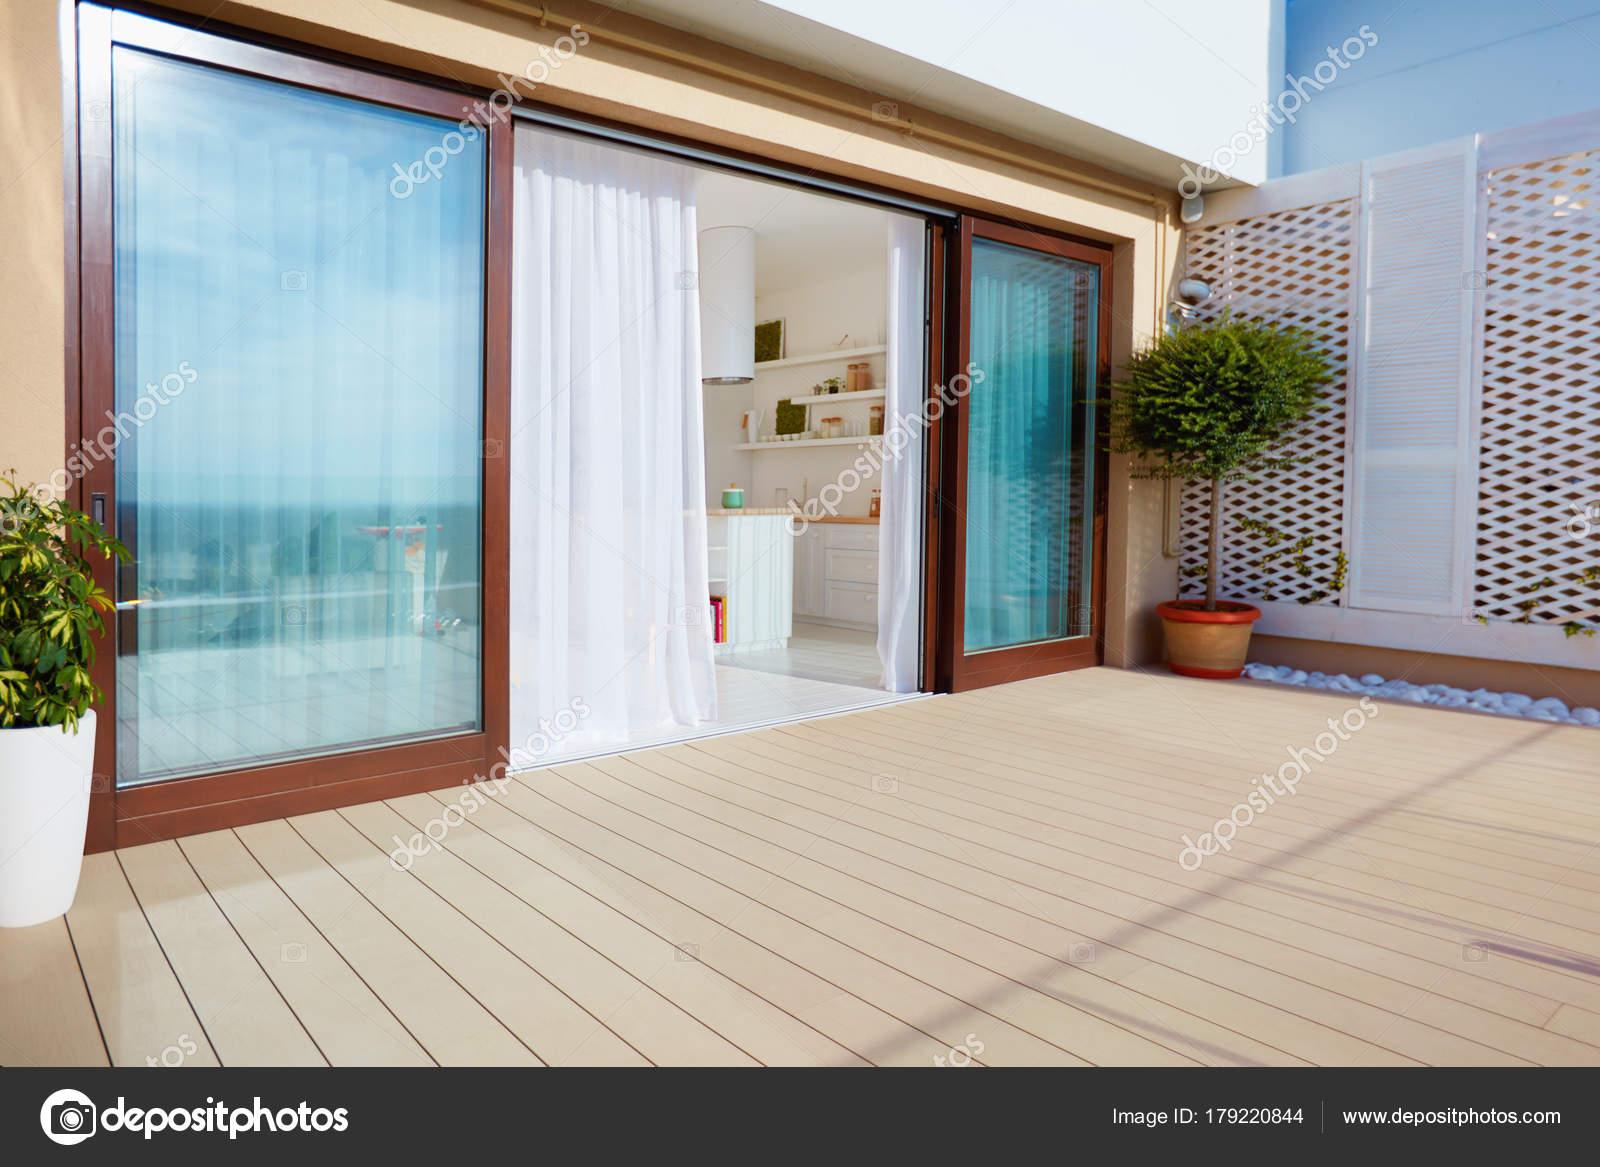 Roof top patio with open space kitchen sliding doors and decking on upper floor u2014 & roof top patio with open space kitchen sliding doors and decking on ...